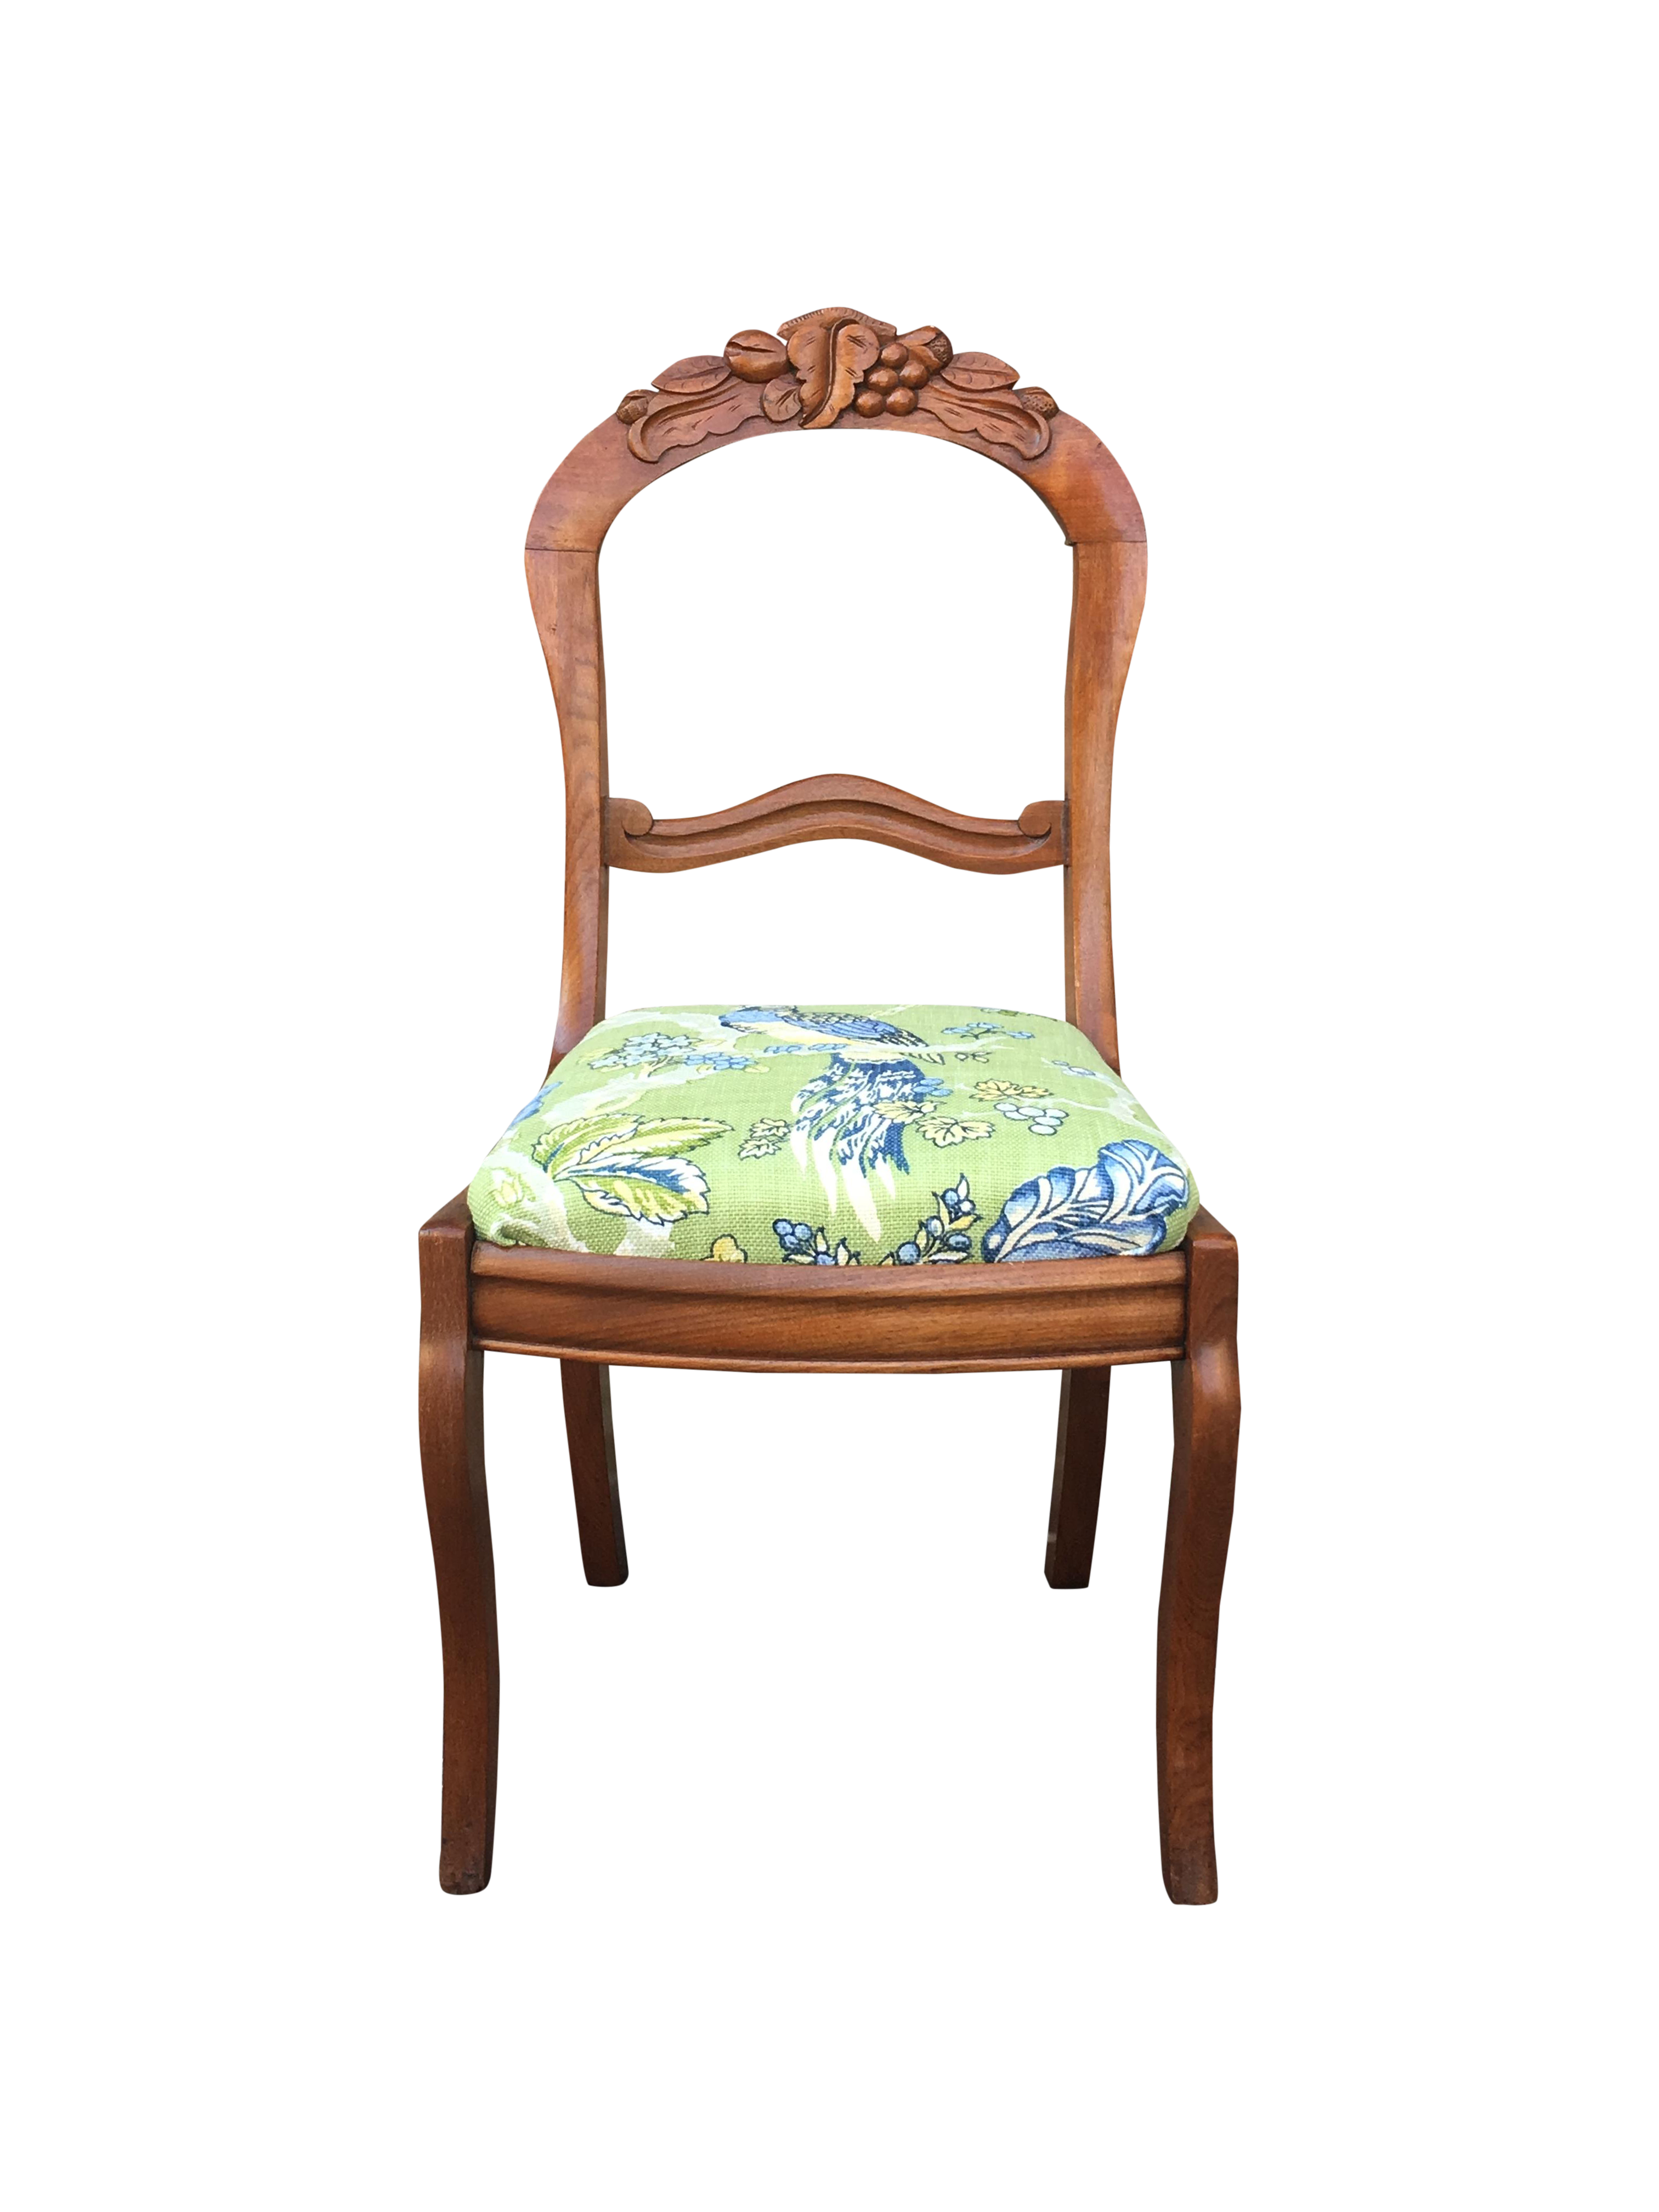 Blue & Green Peacock & Floral Chair